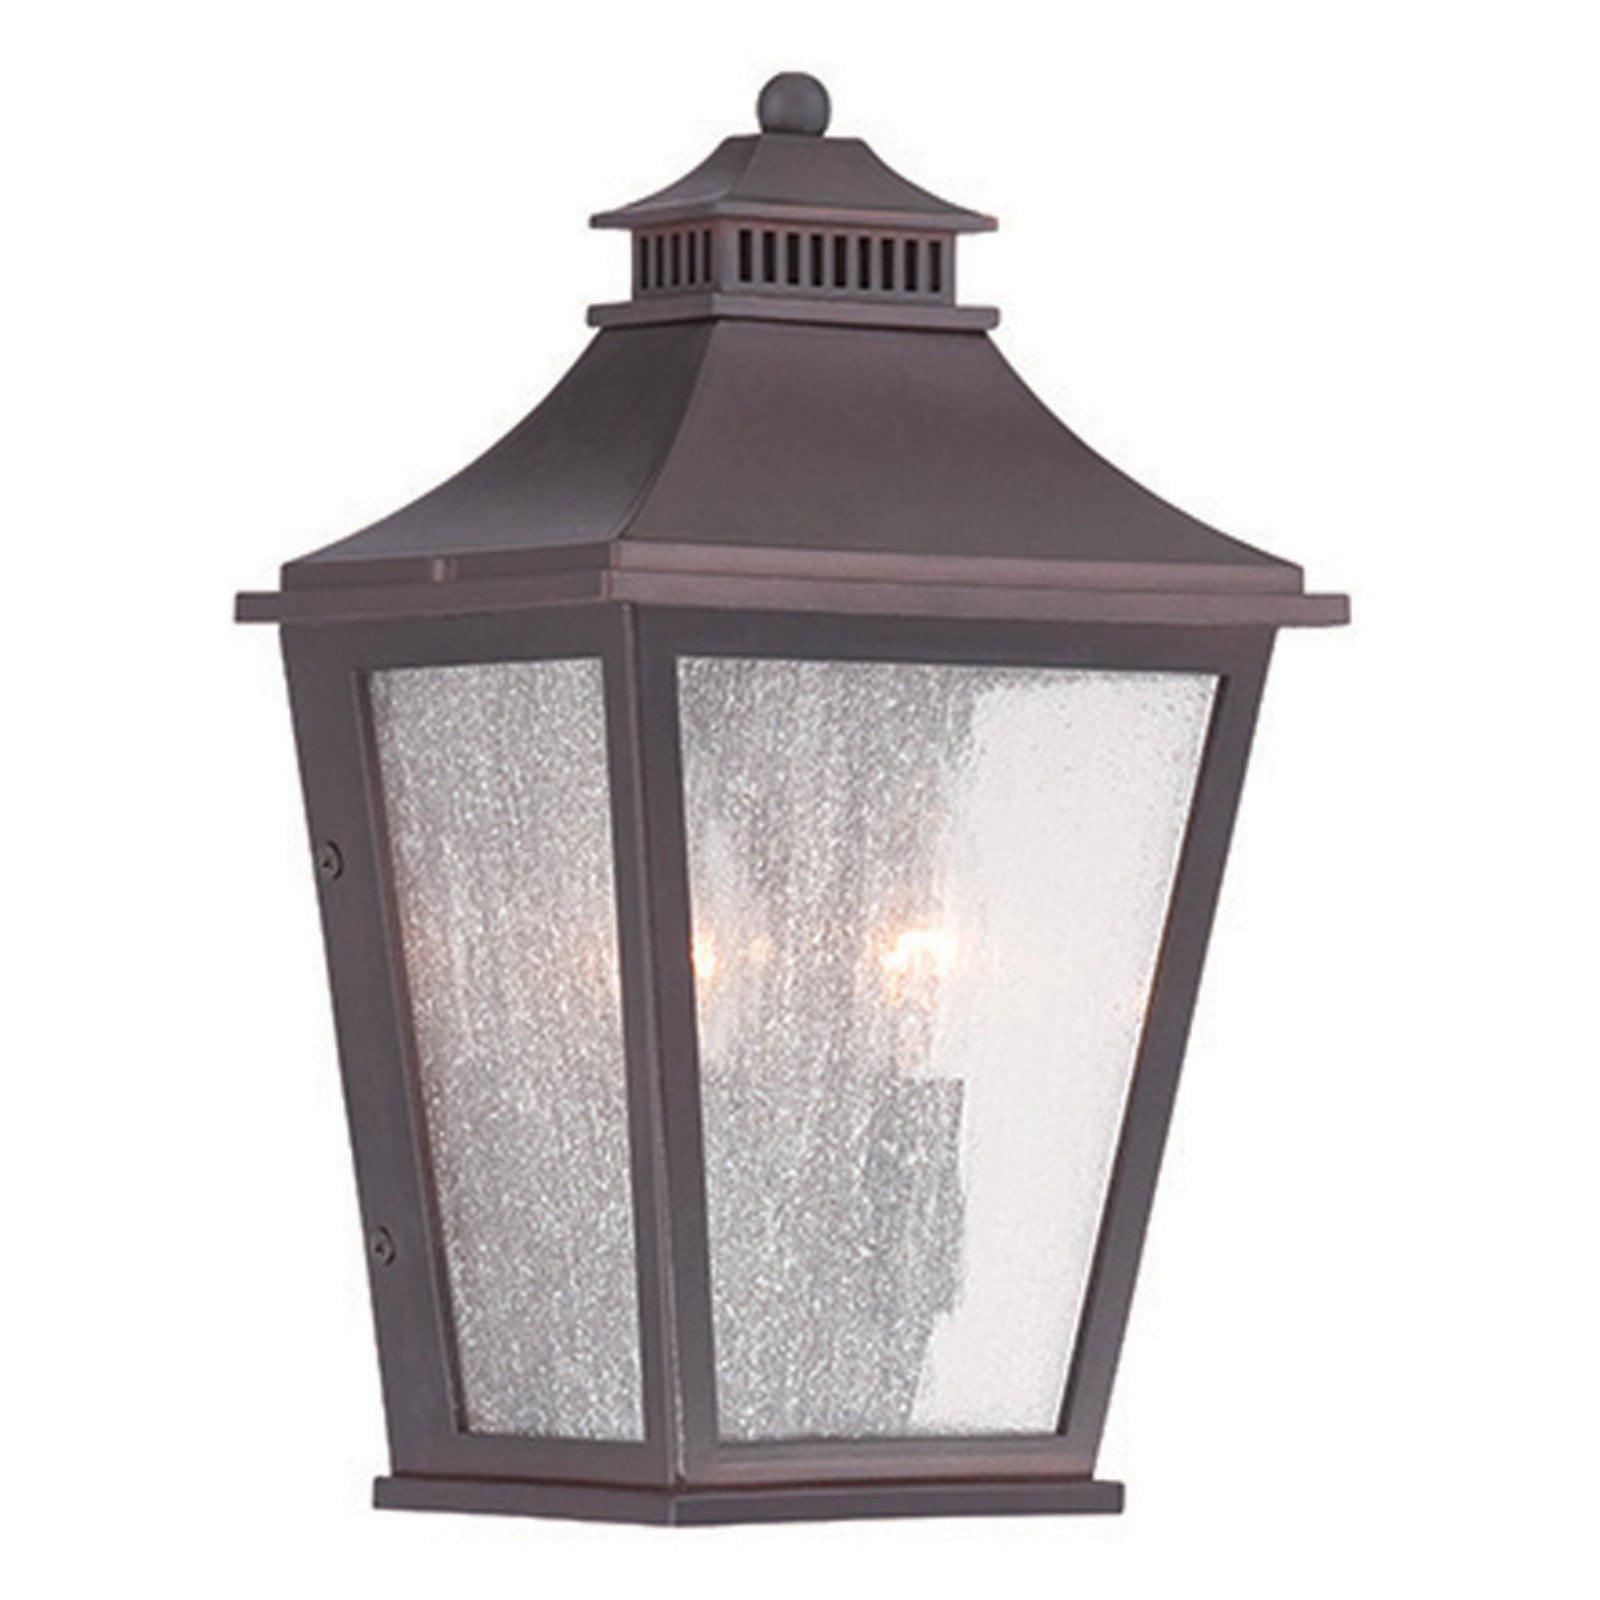 Acclaim Lighting Chapel Hill 7.5 in. Outdoor Wall Mount Lantern Light Fixture